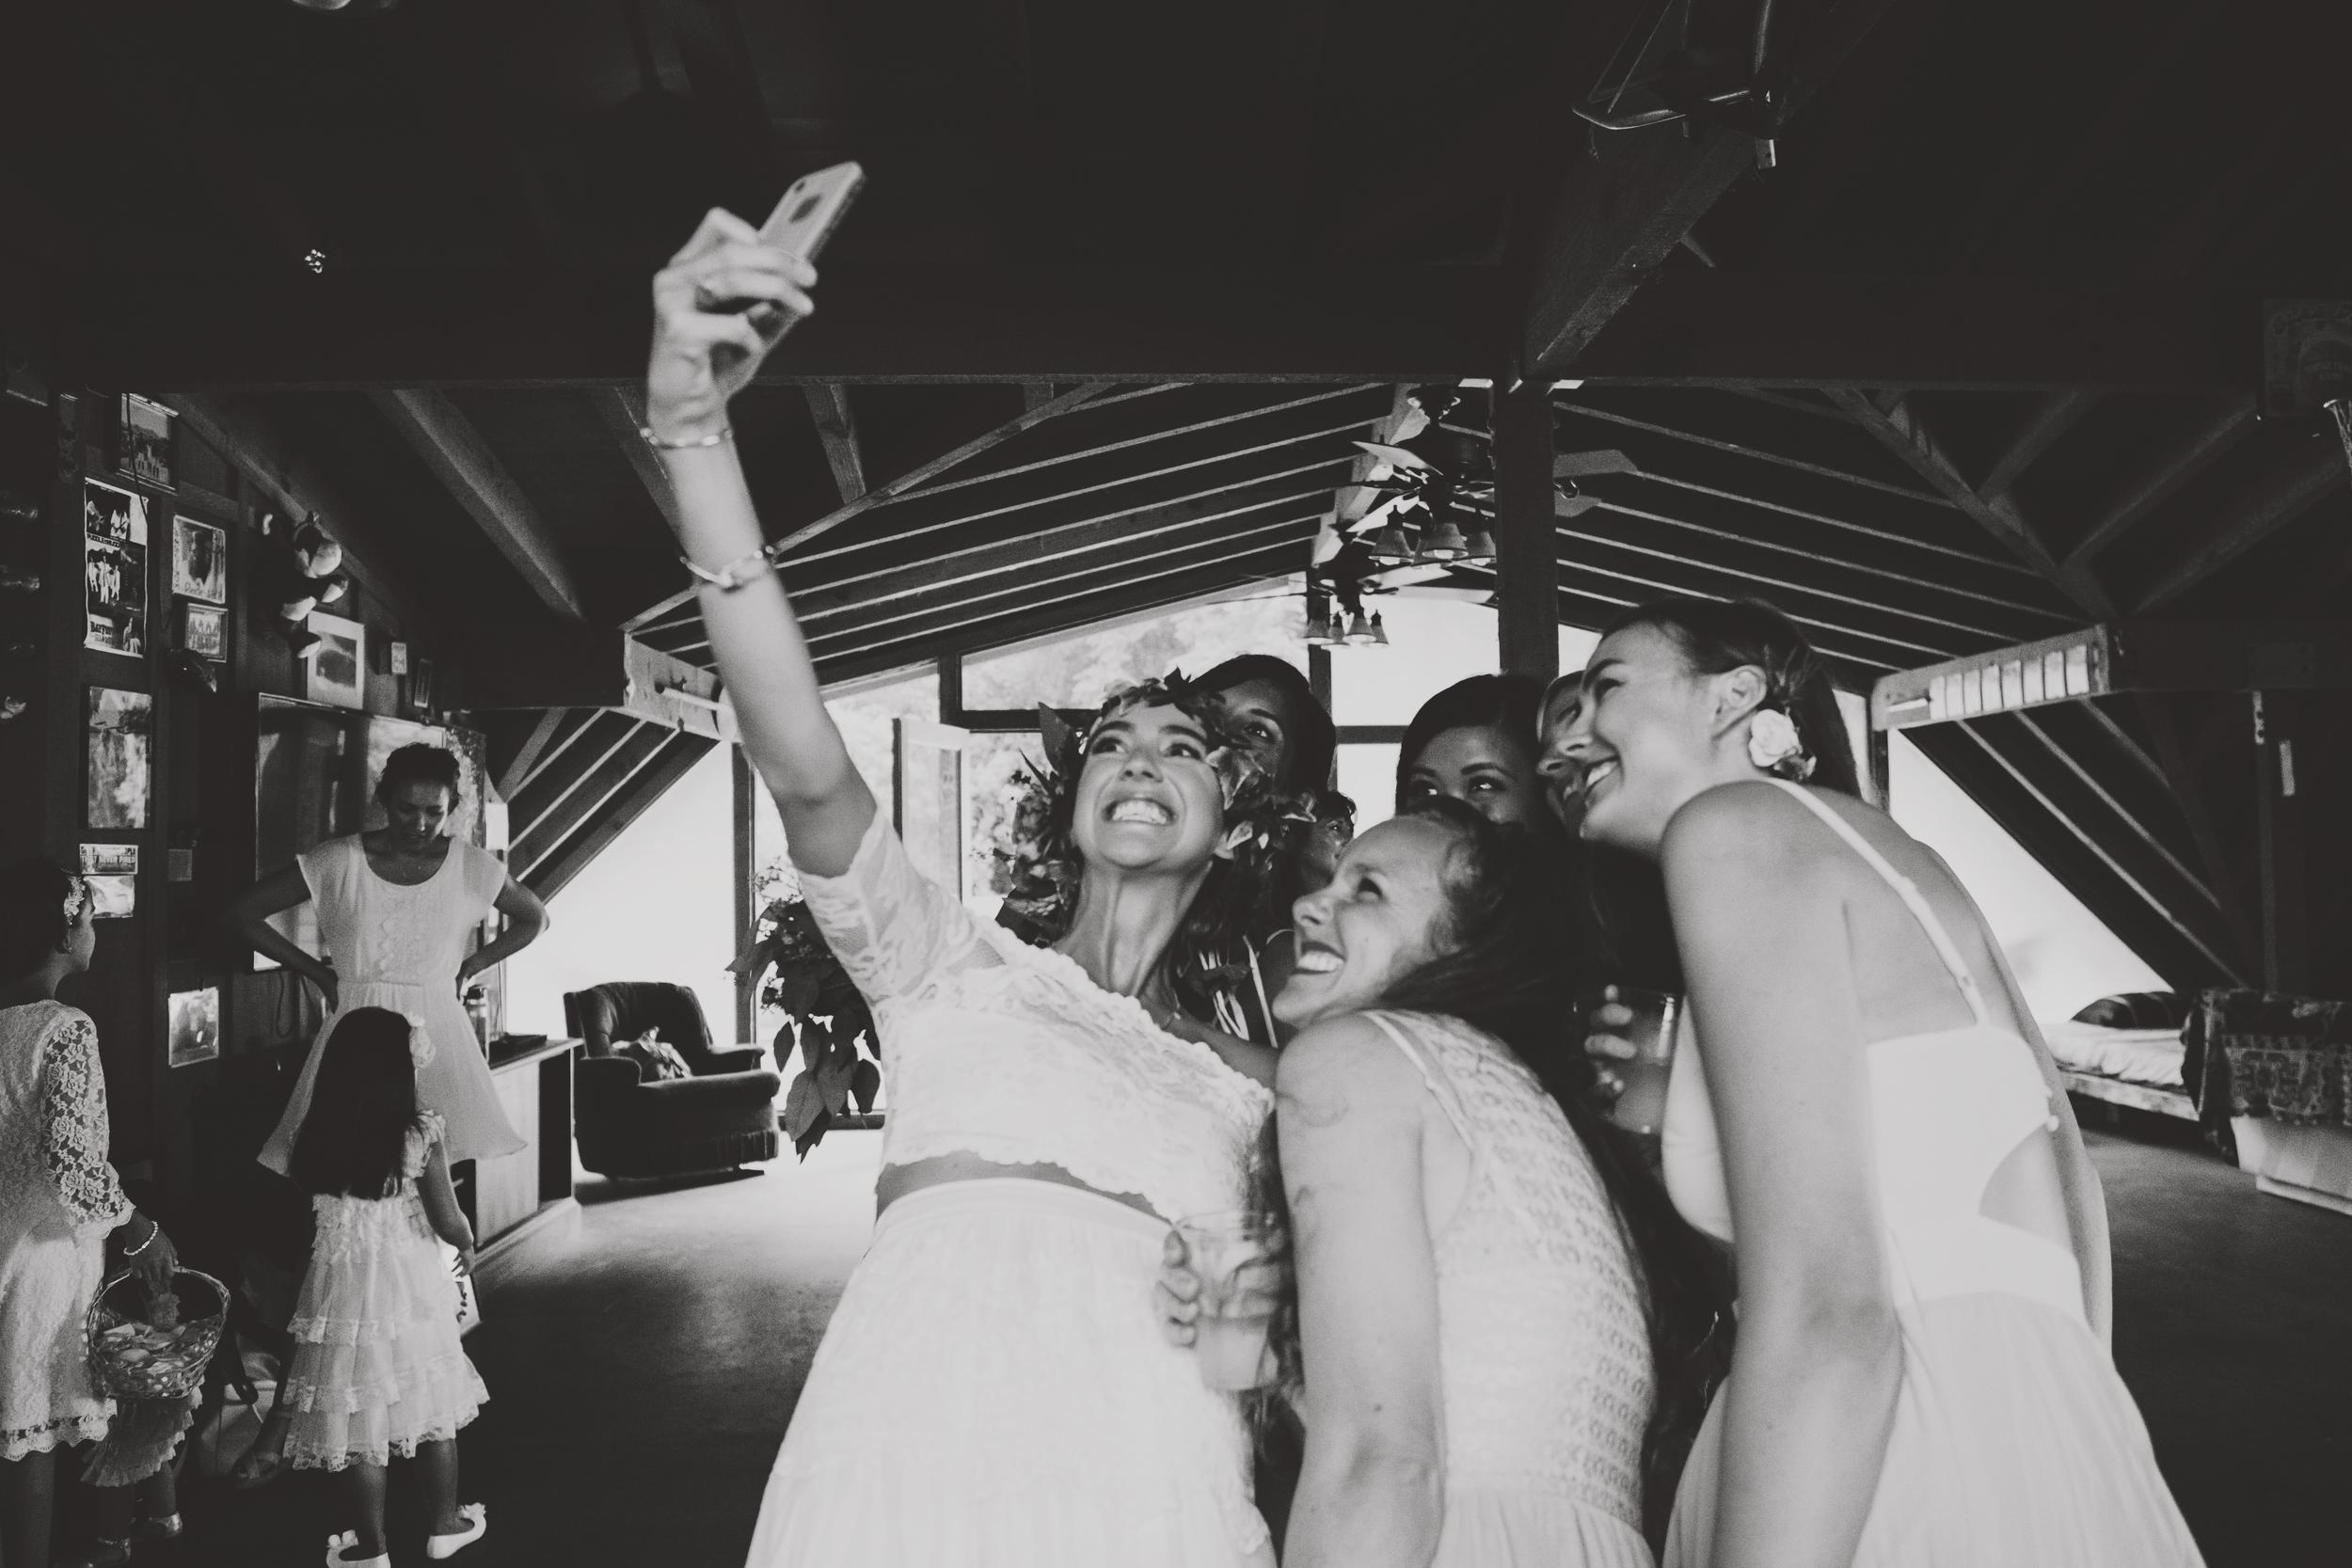 angie-diaz-photography-oahu-hawaii-wedding-tradewinds-ranch-116.jpg